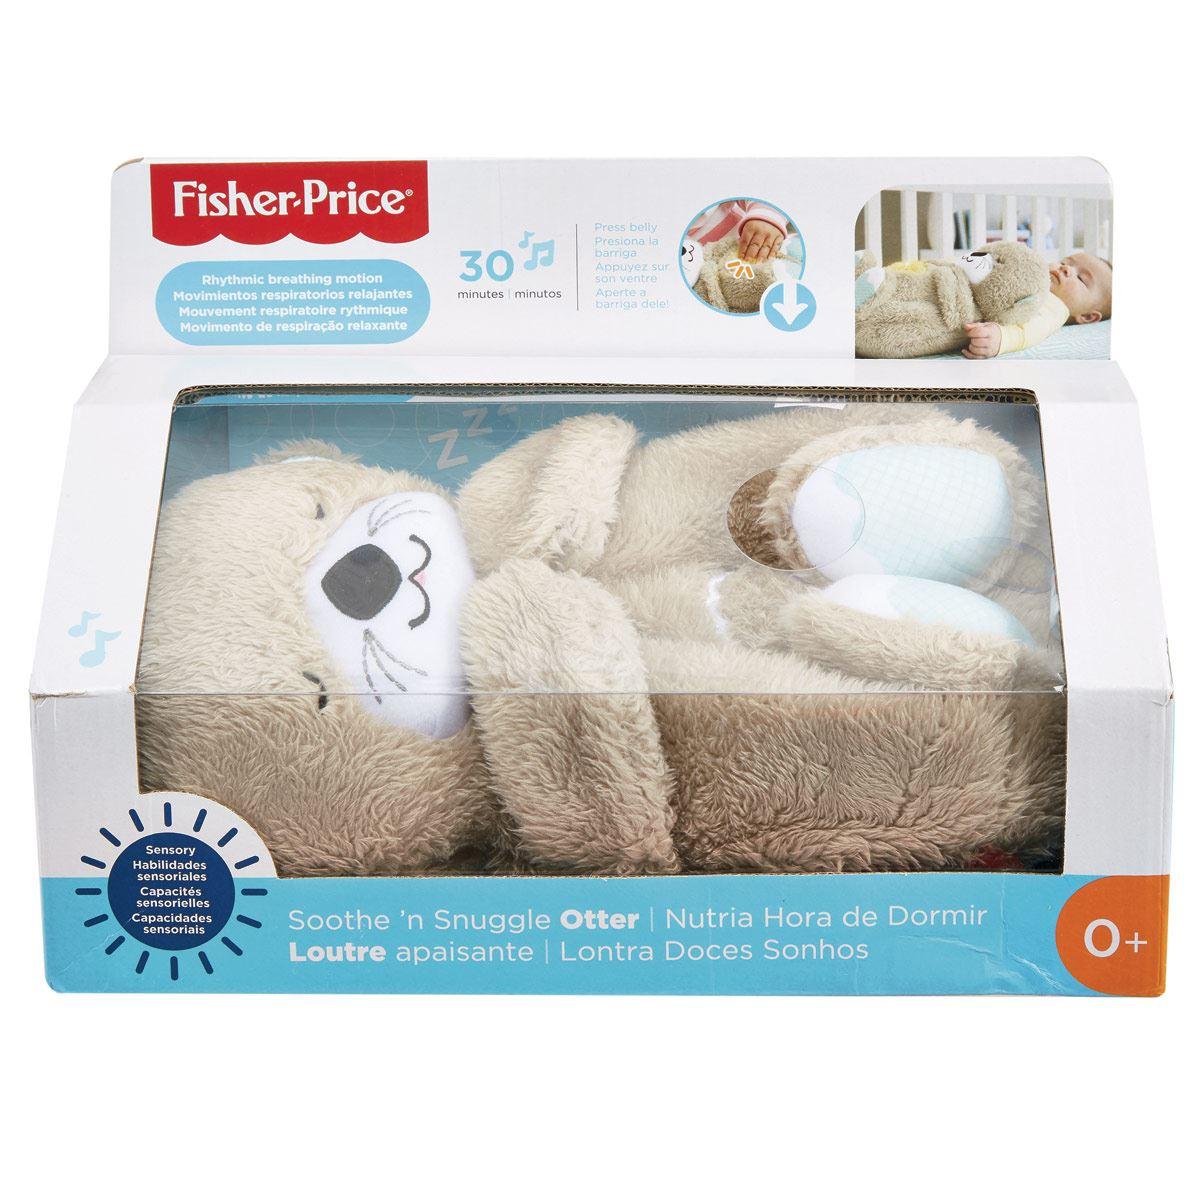 Fisher Price Nutria Hora de Dormir